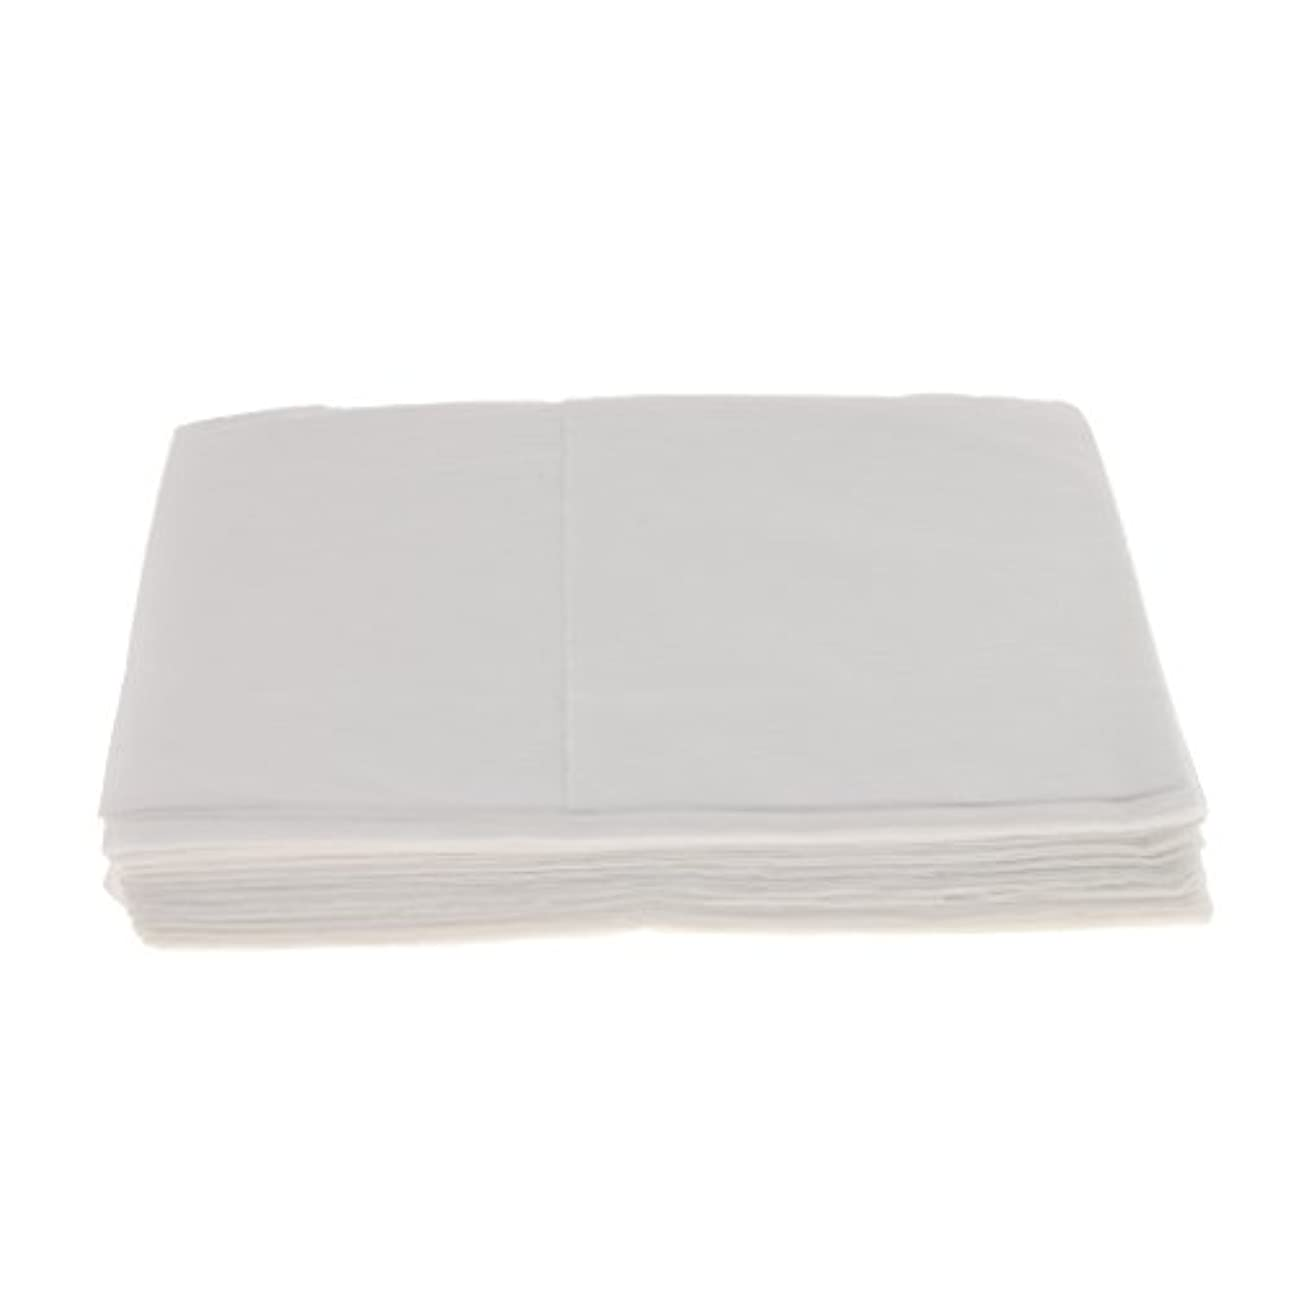 Baosity 10枚 使い捨て ベッドシーツ サロン ホテル ベッドパッド カバー シート 2色選べ - 白